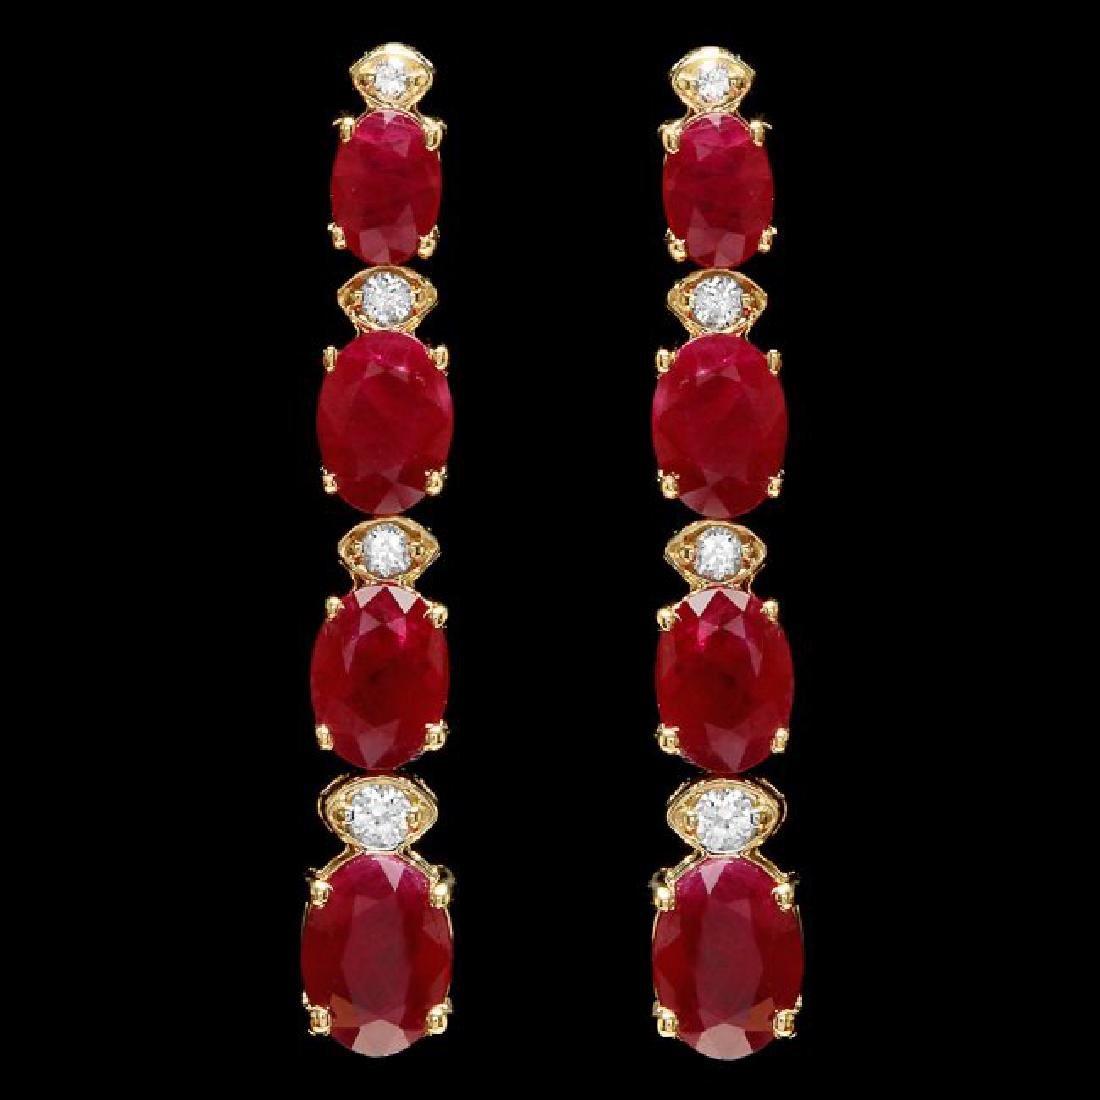 14k Gold 8.00ct Ruby 0.30ct Diamond Earrings - 2